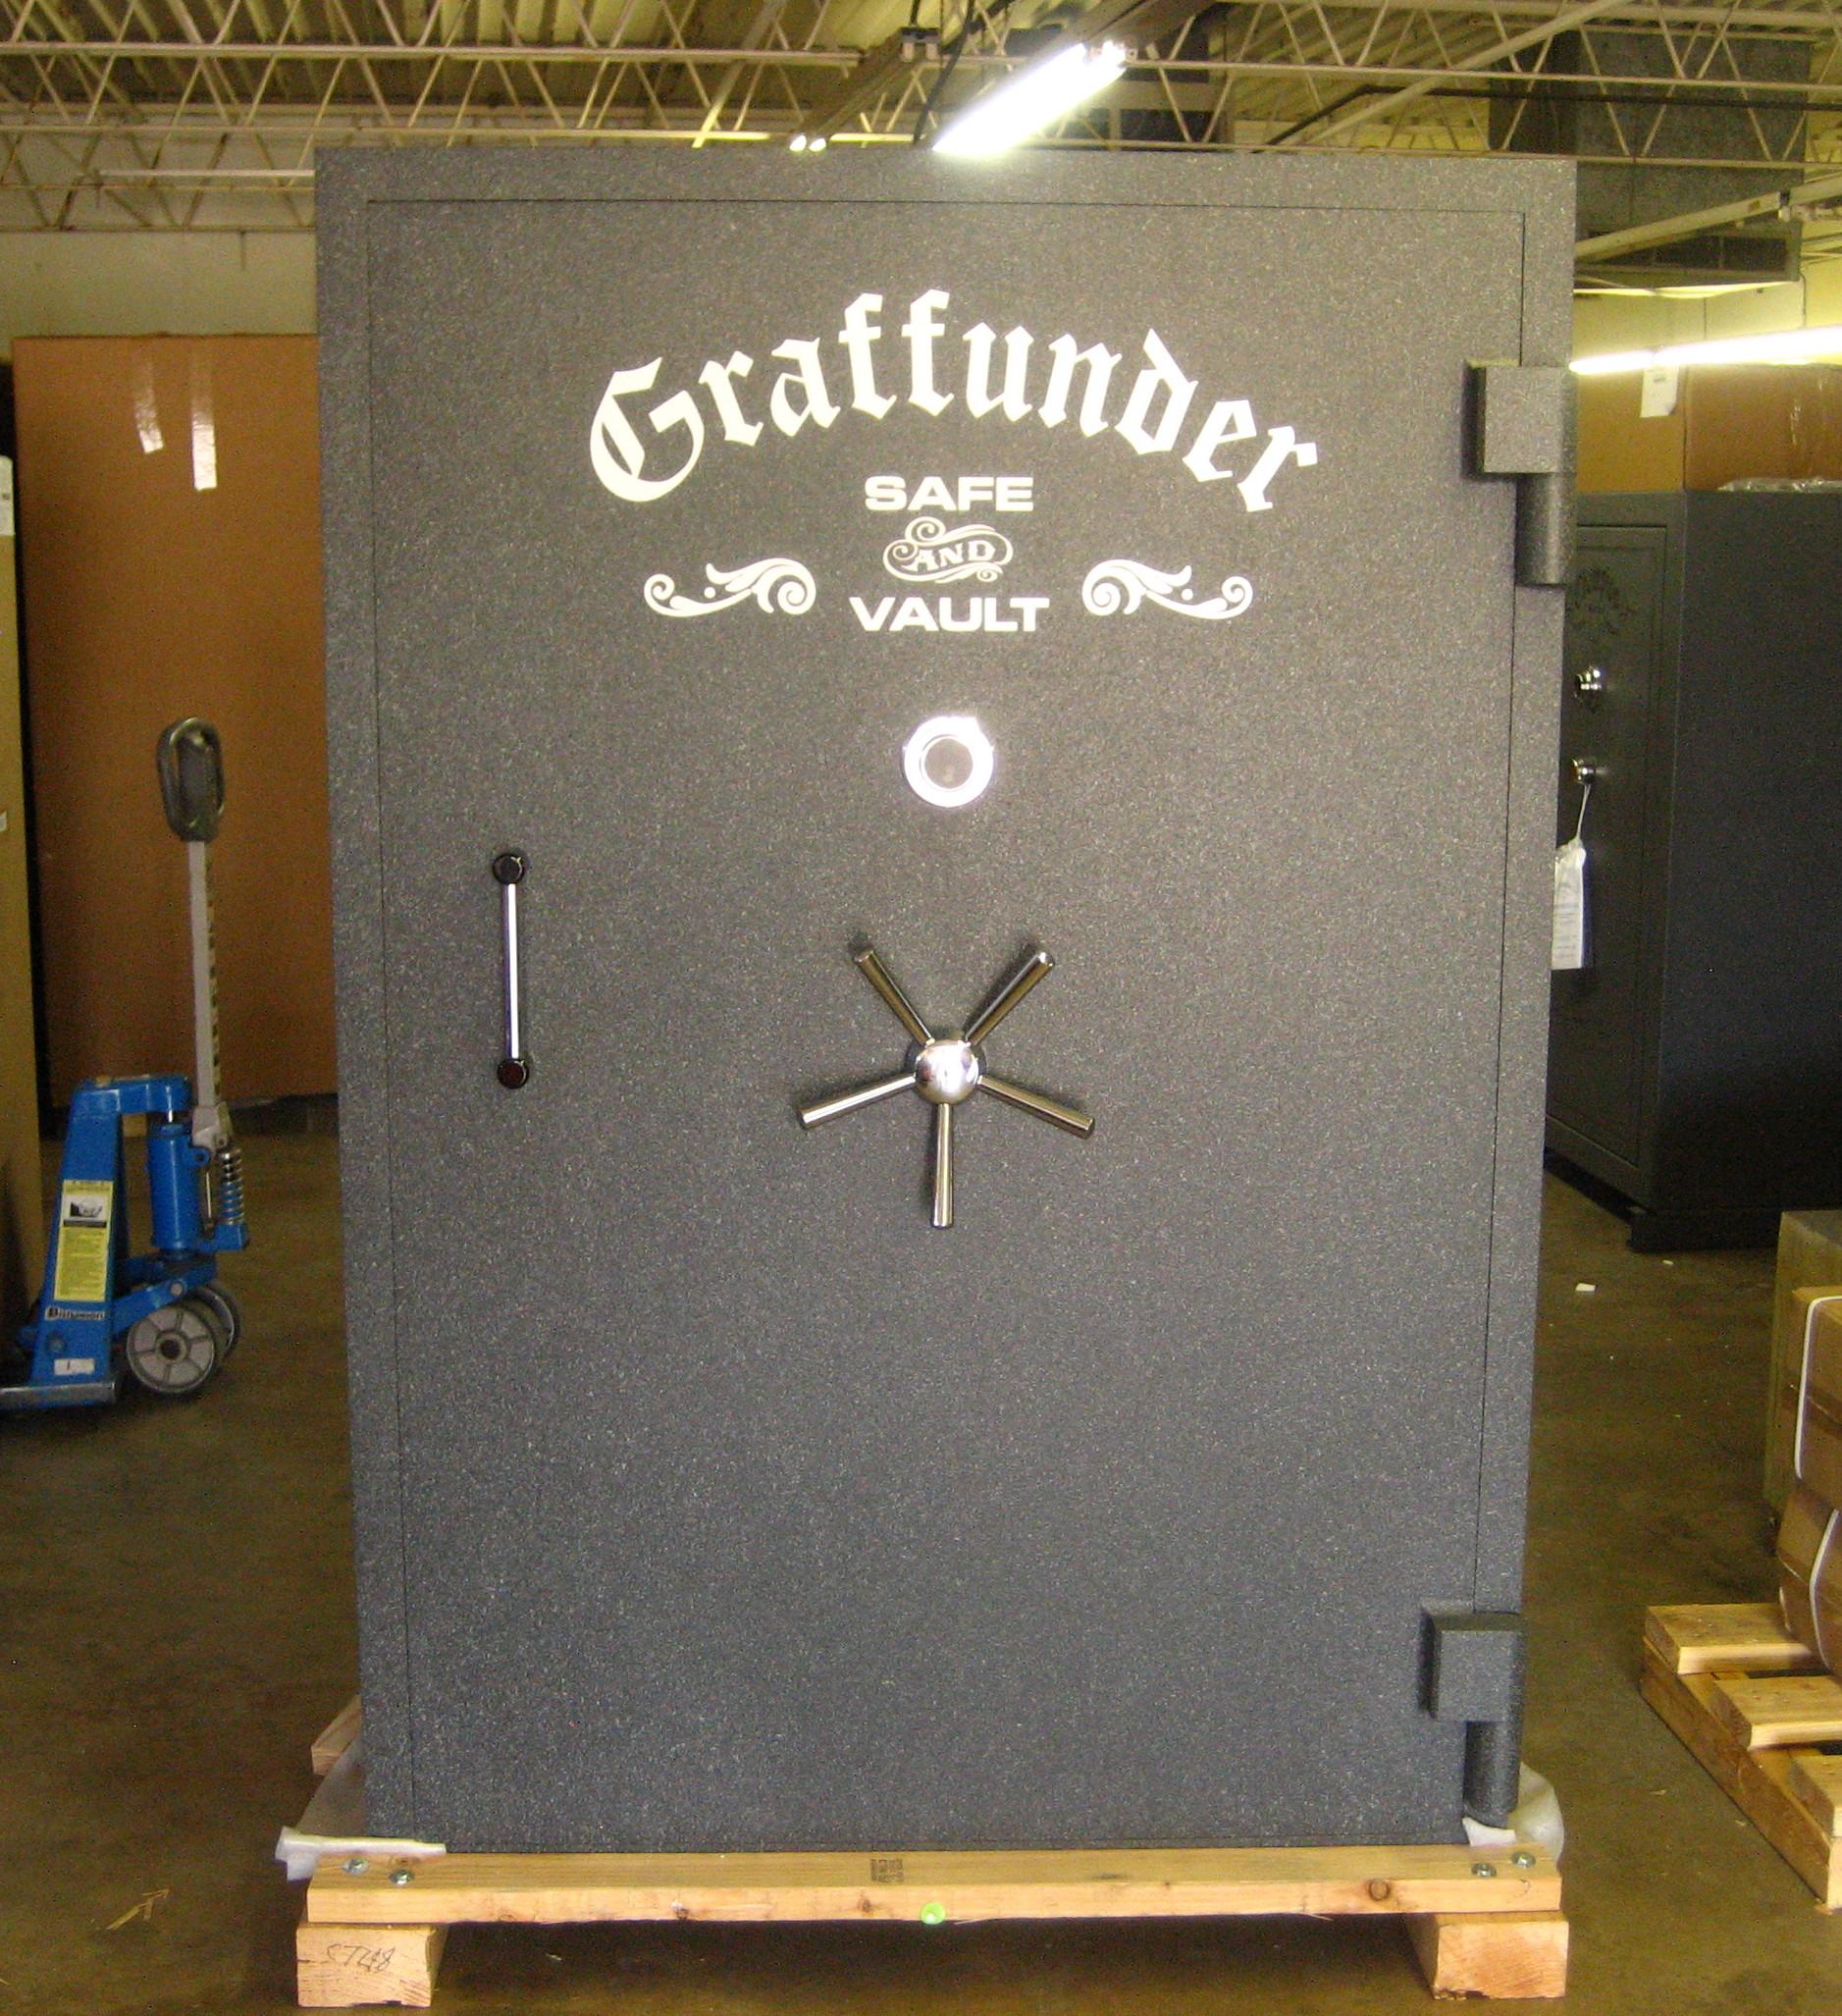 Graffunder Safes Dallas Ft Worth Texas